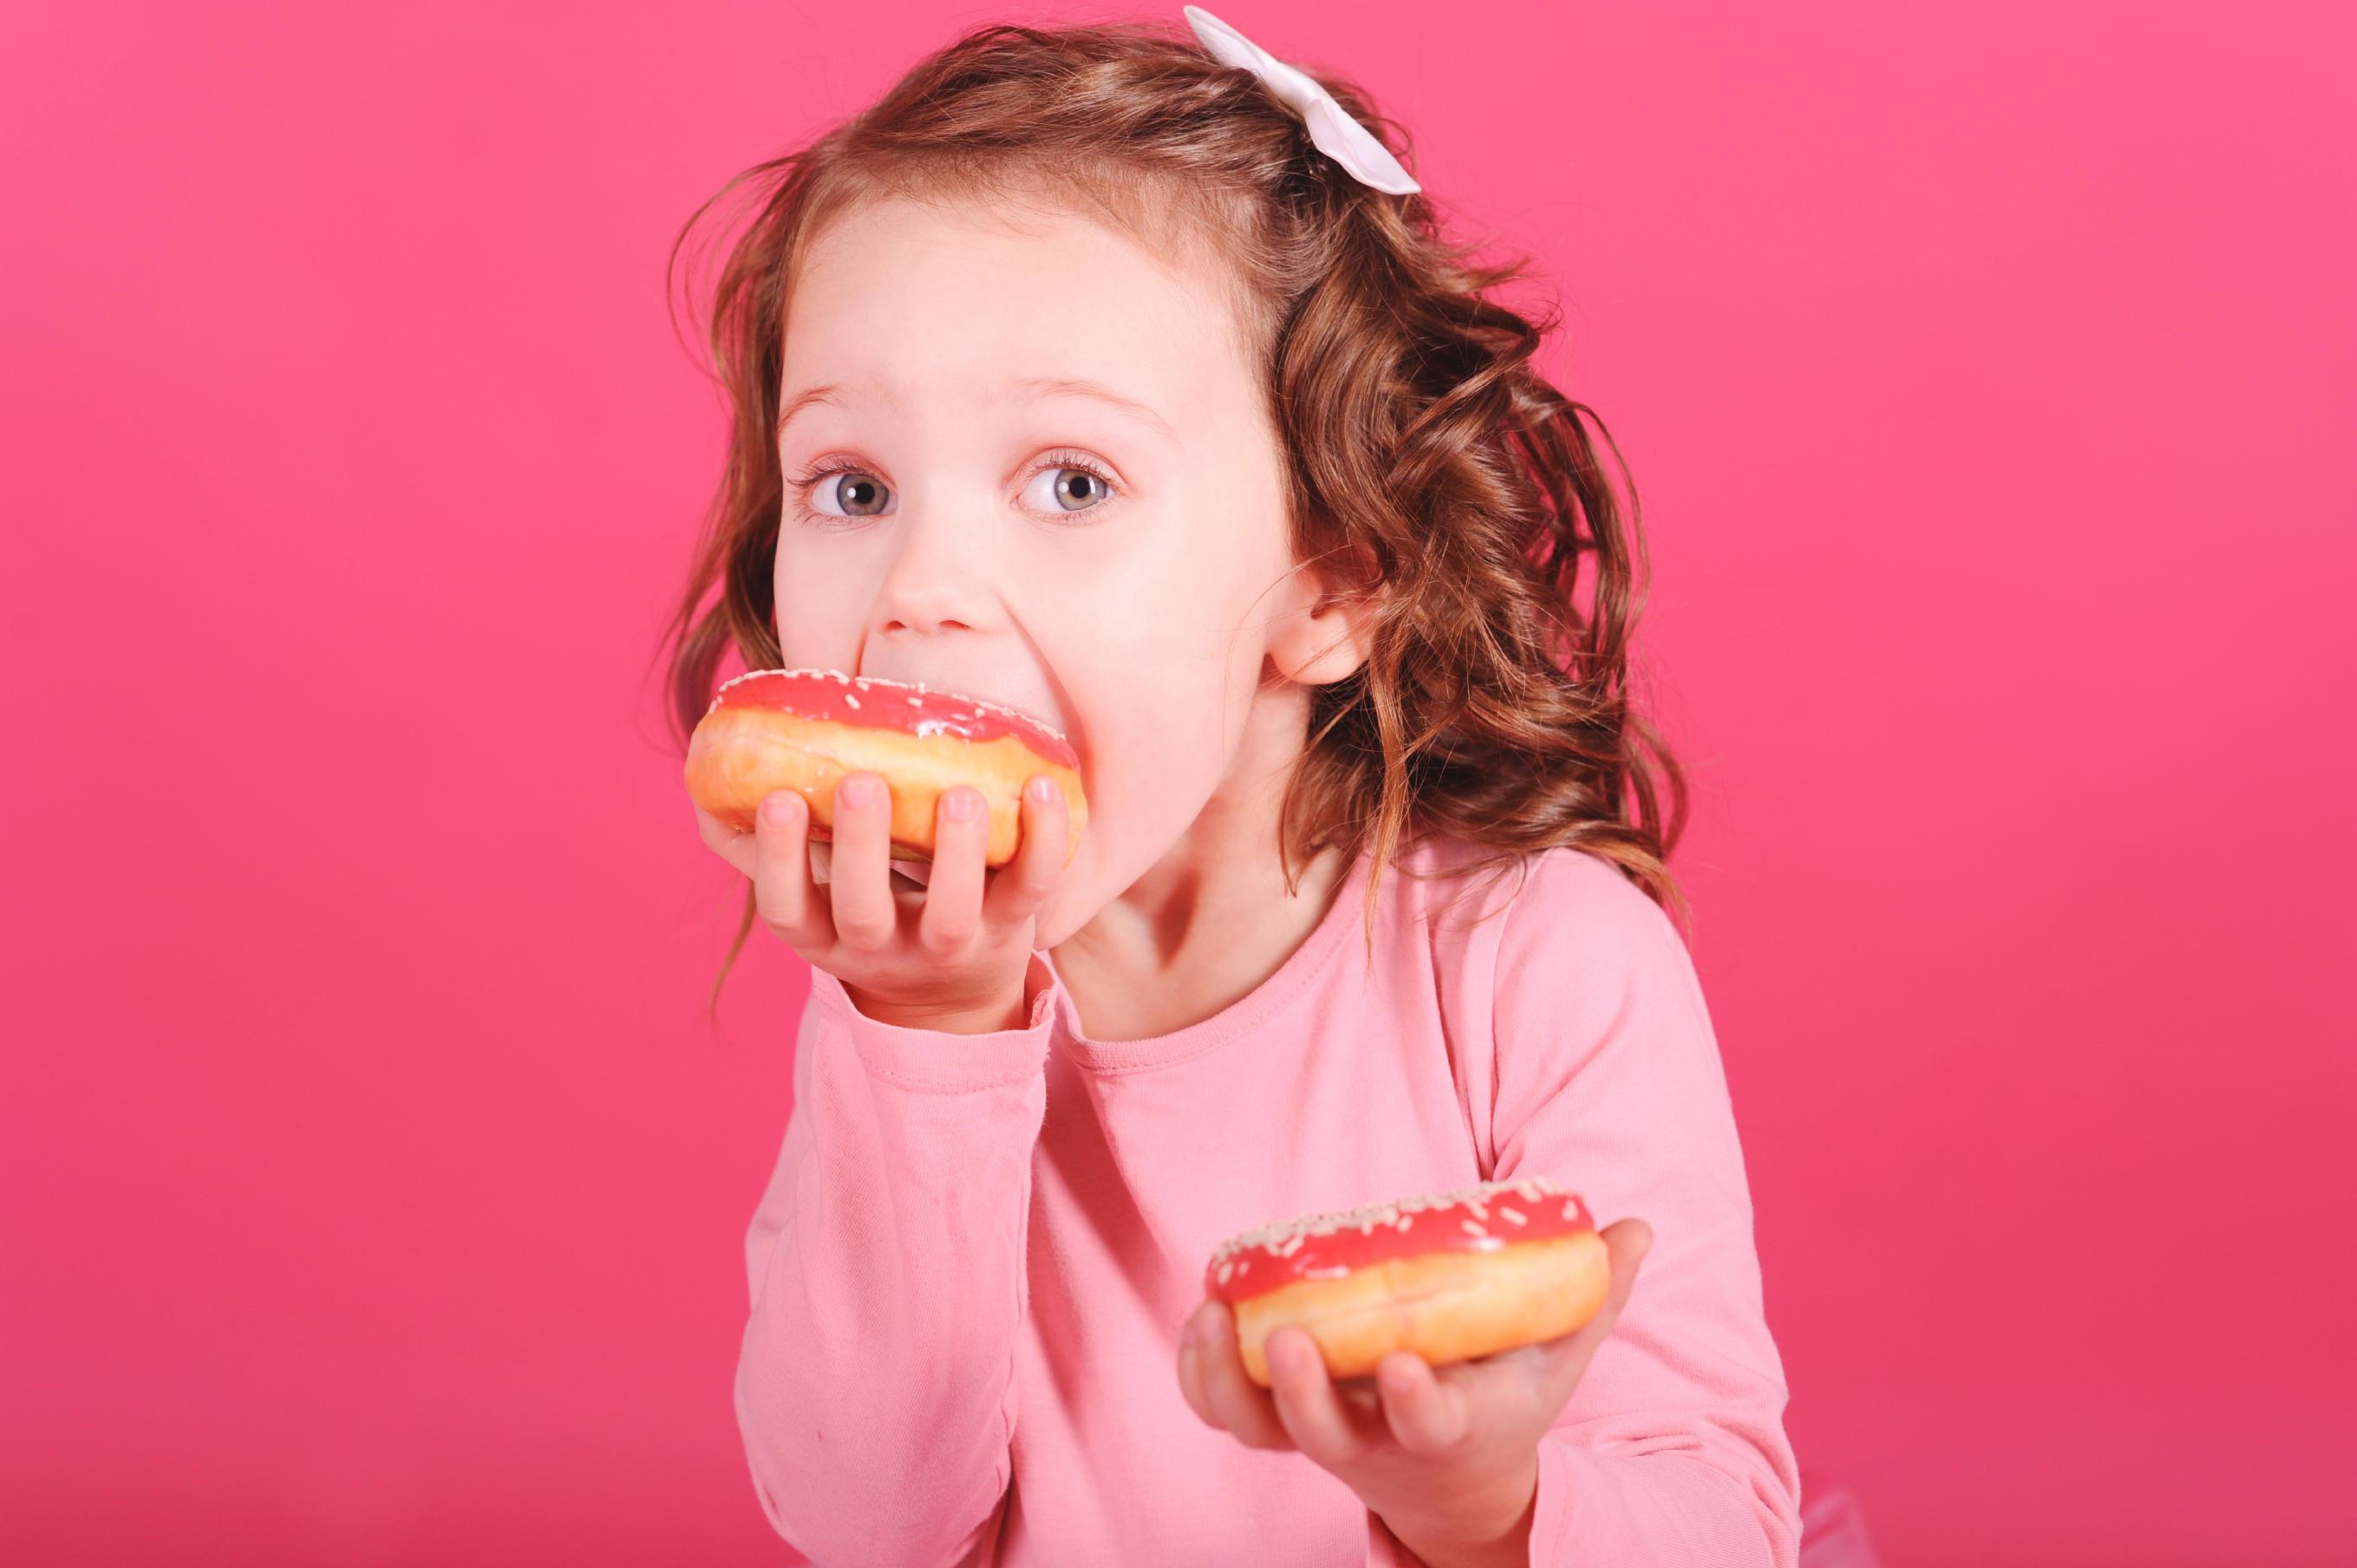 Donut King image 1